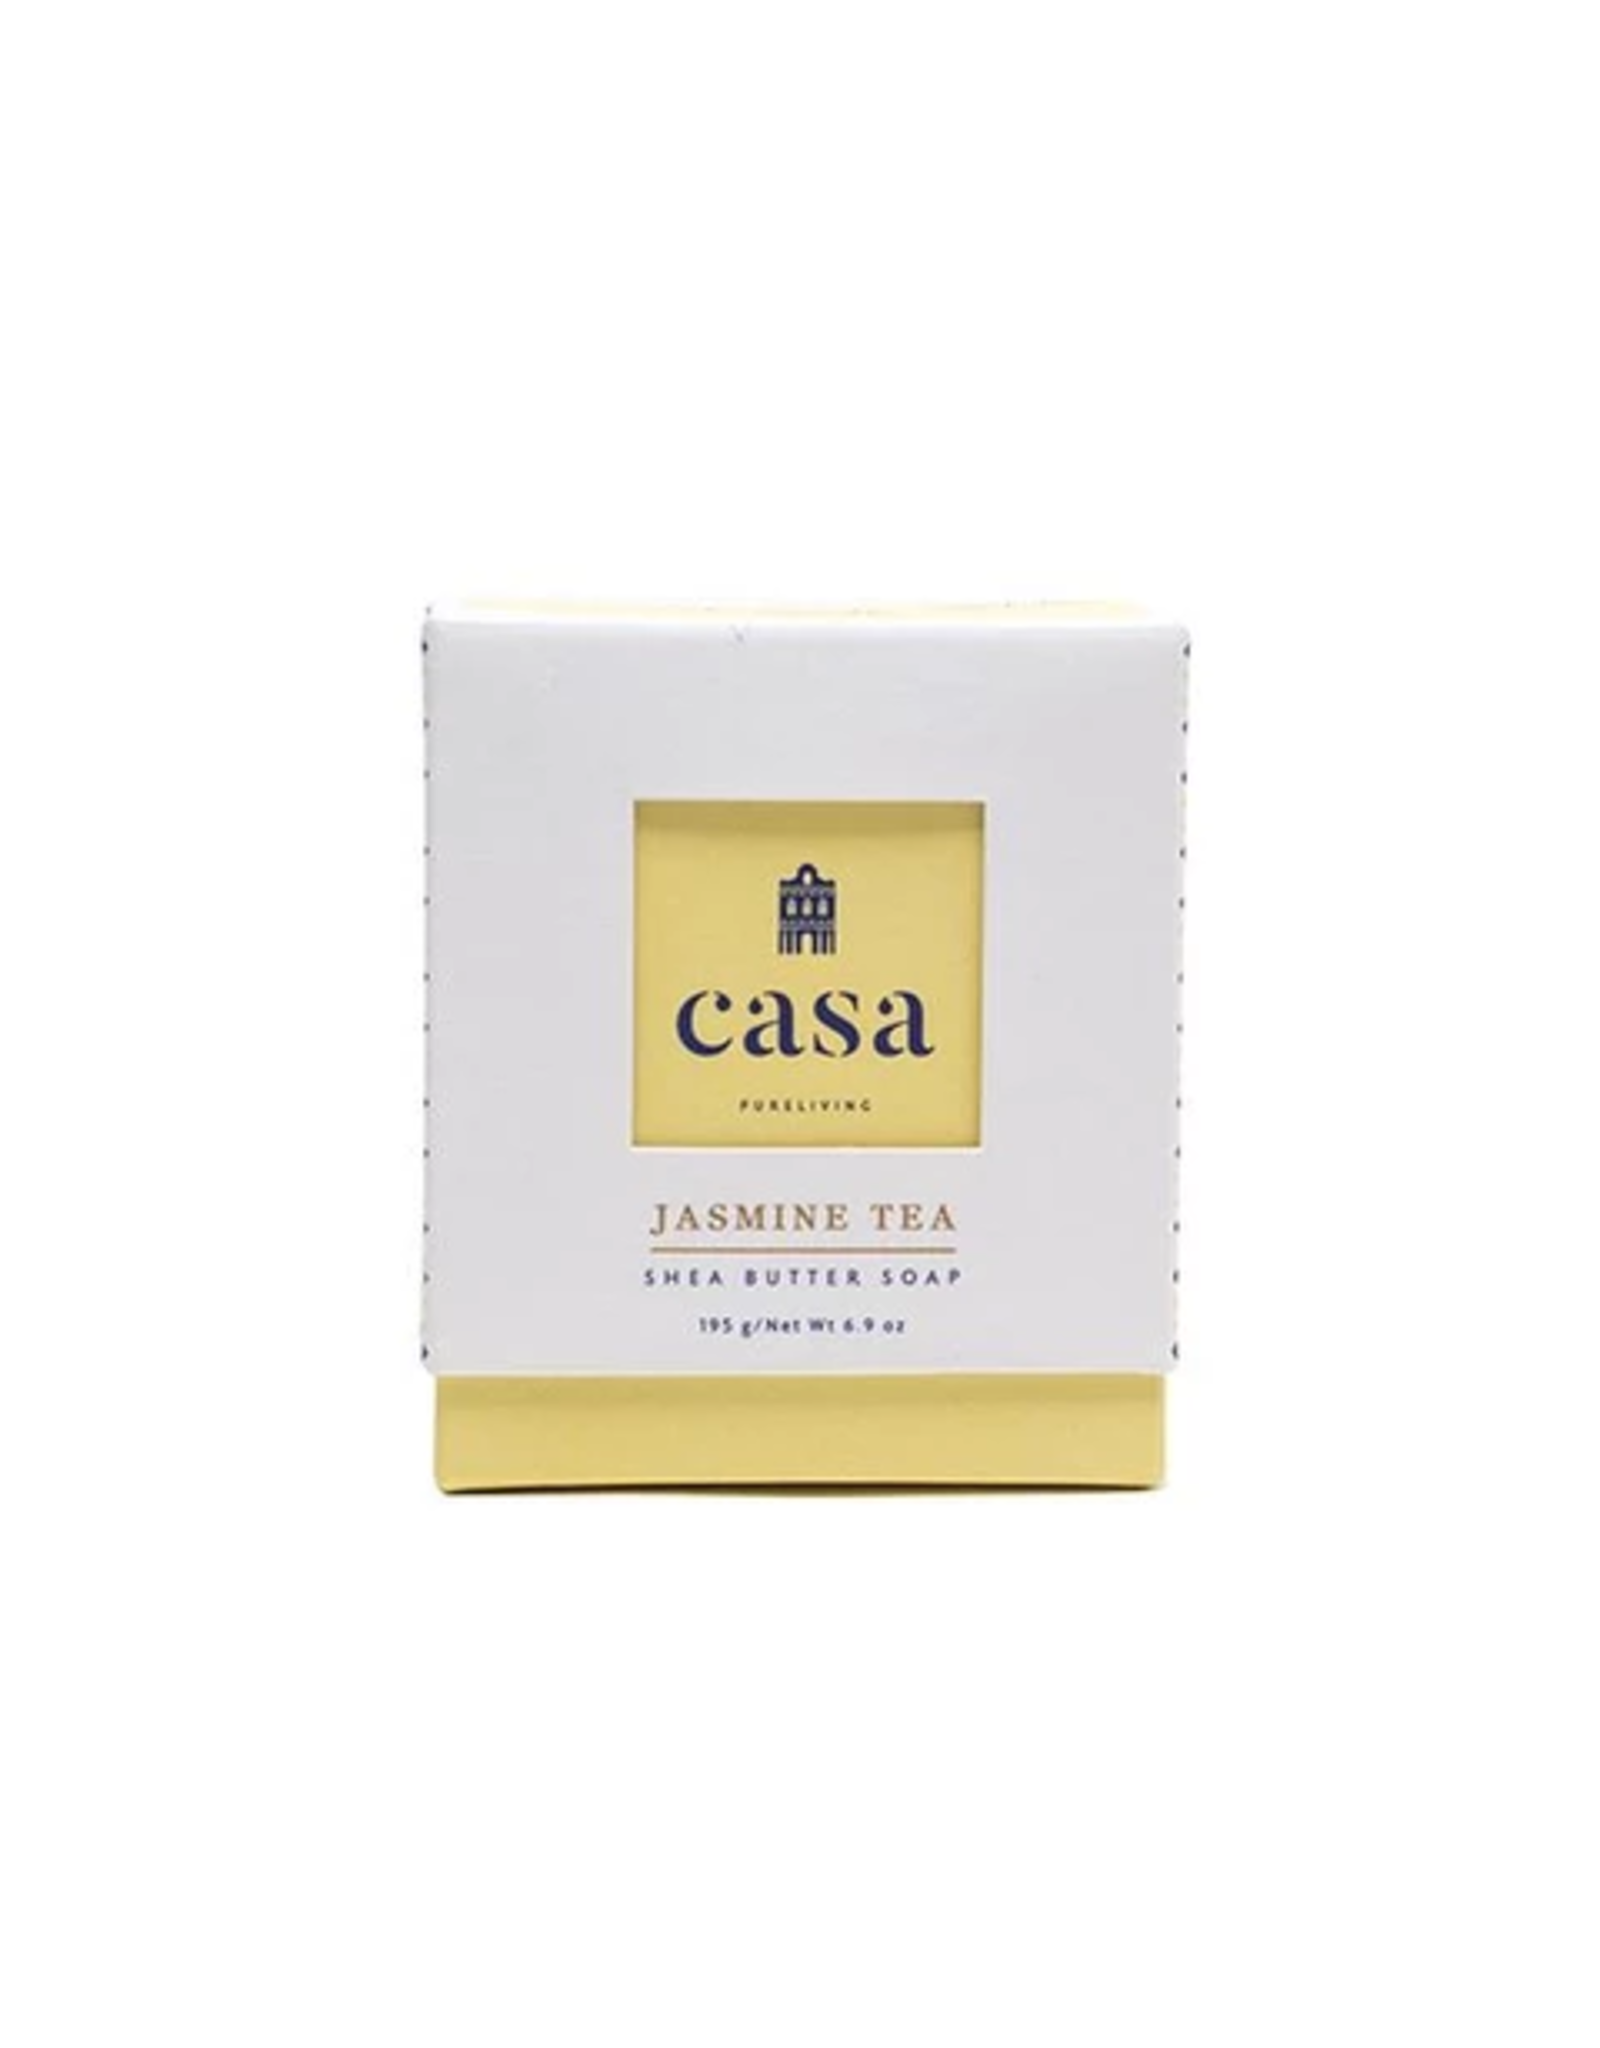 Aromasource Jasmine Tea Shea butter soap